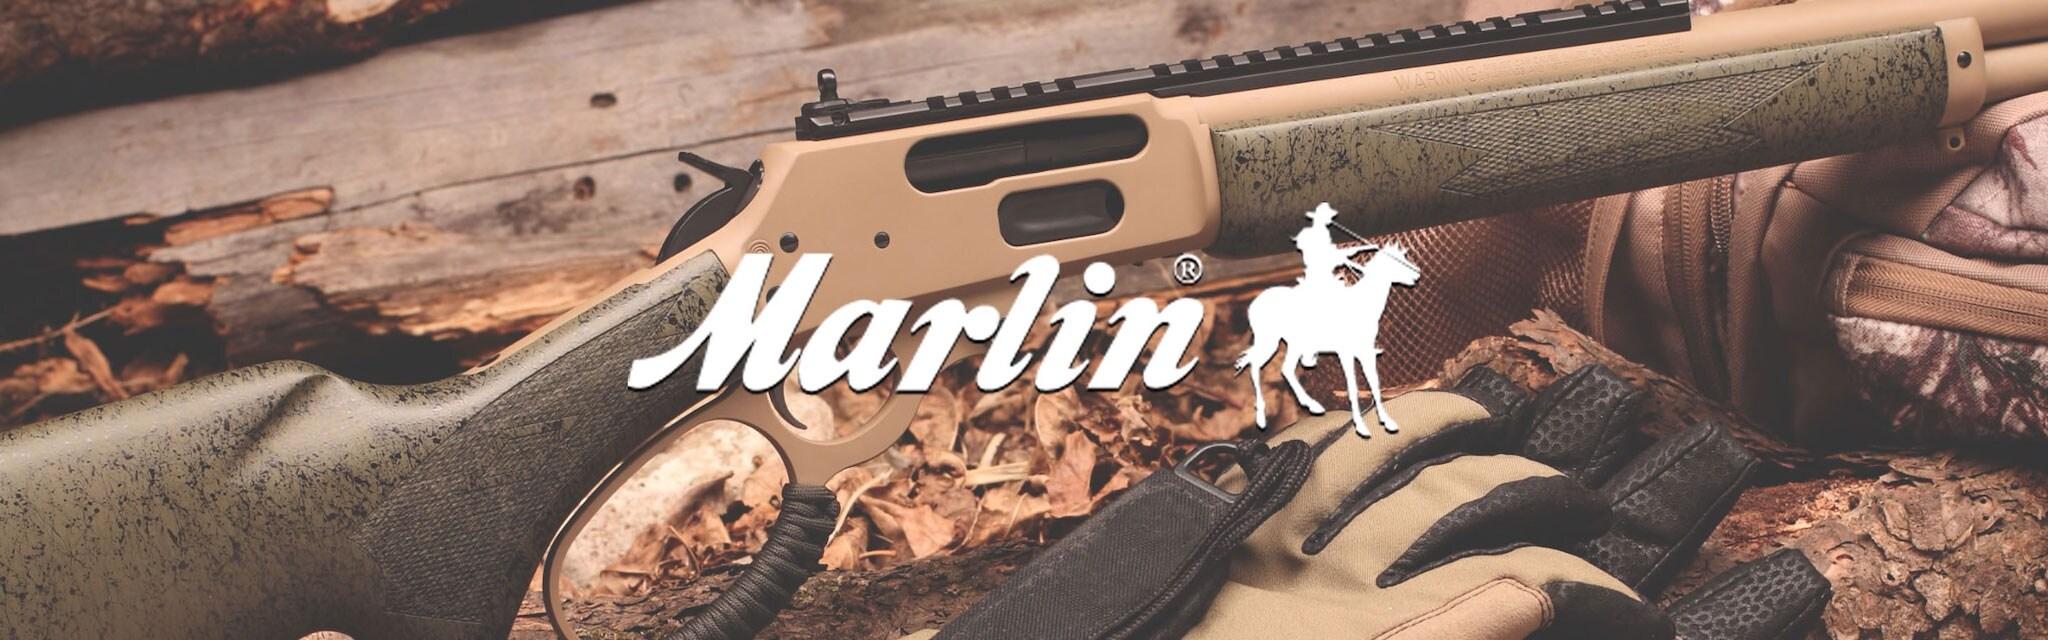 Marlin Firearms Brand Banner